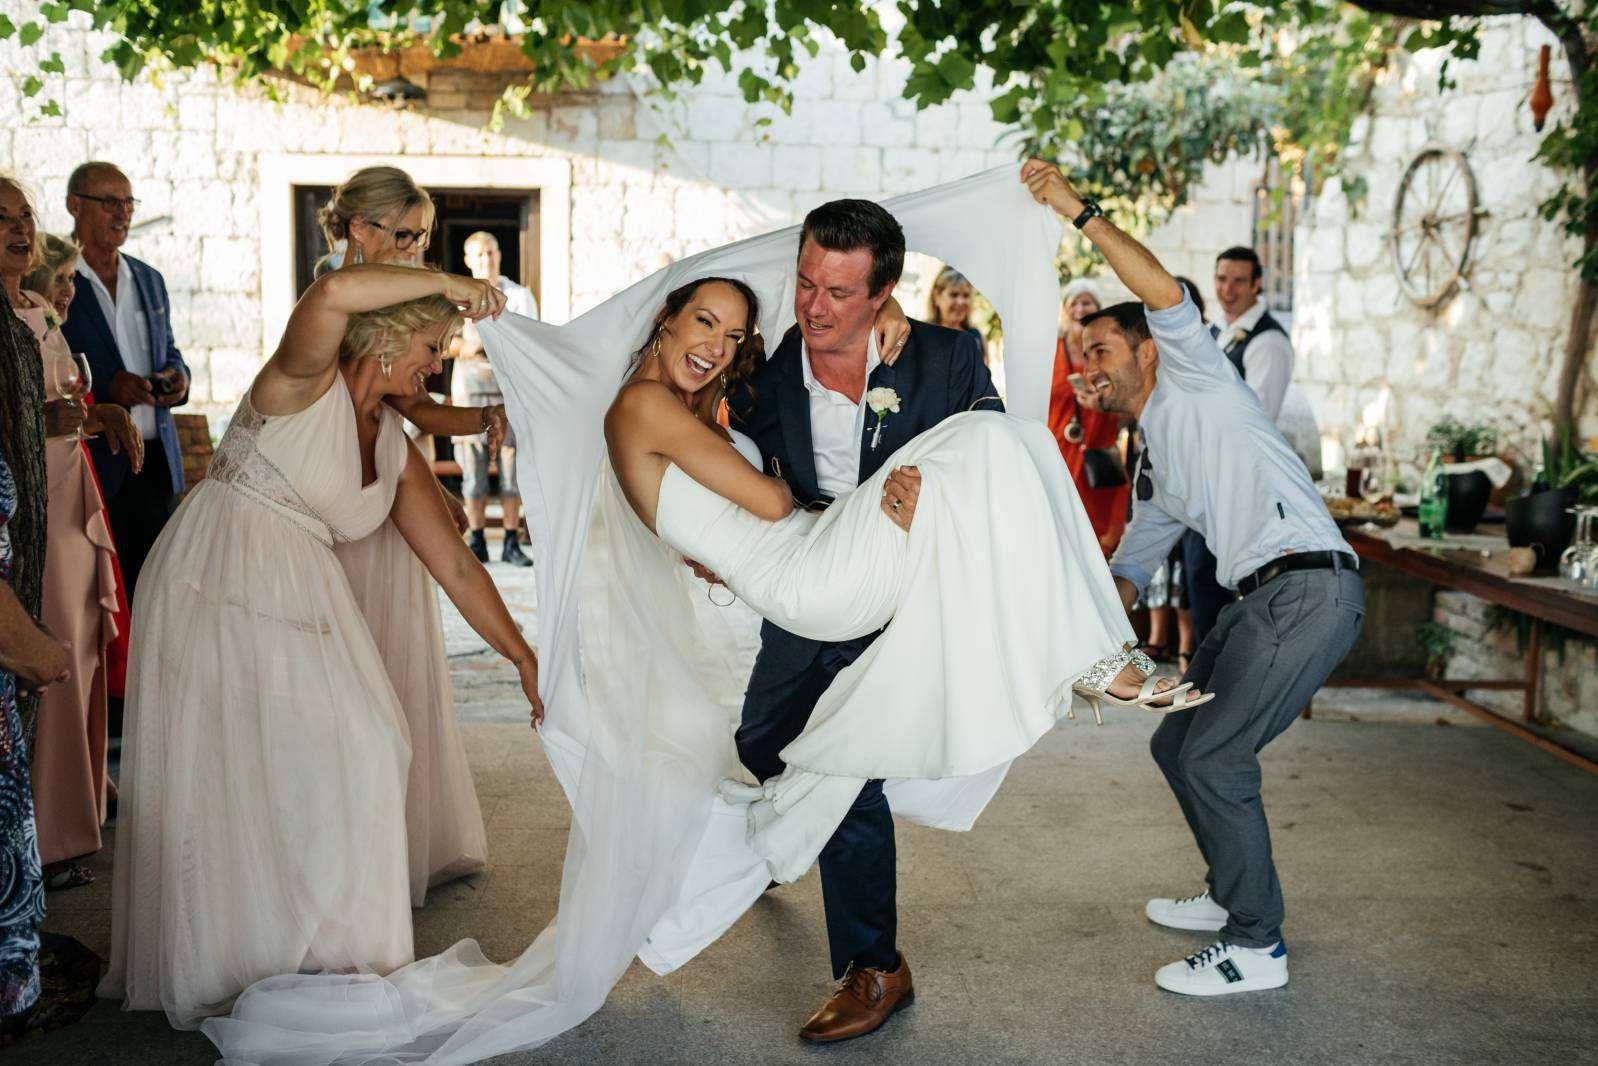 legal requirements wedding in croatia